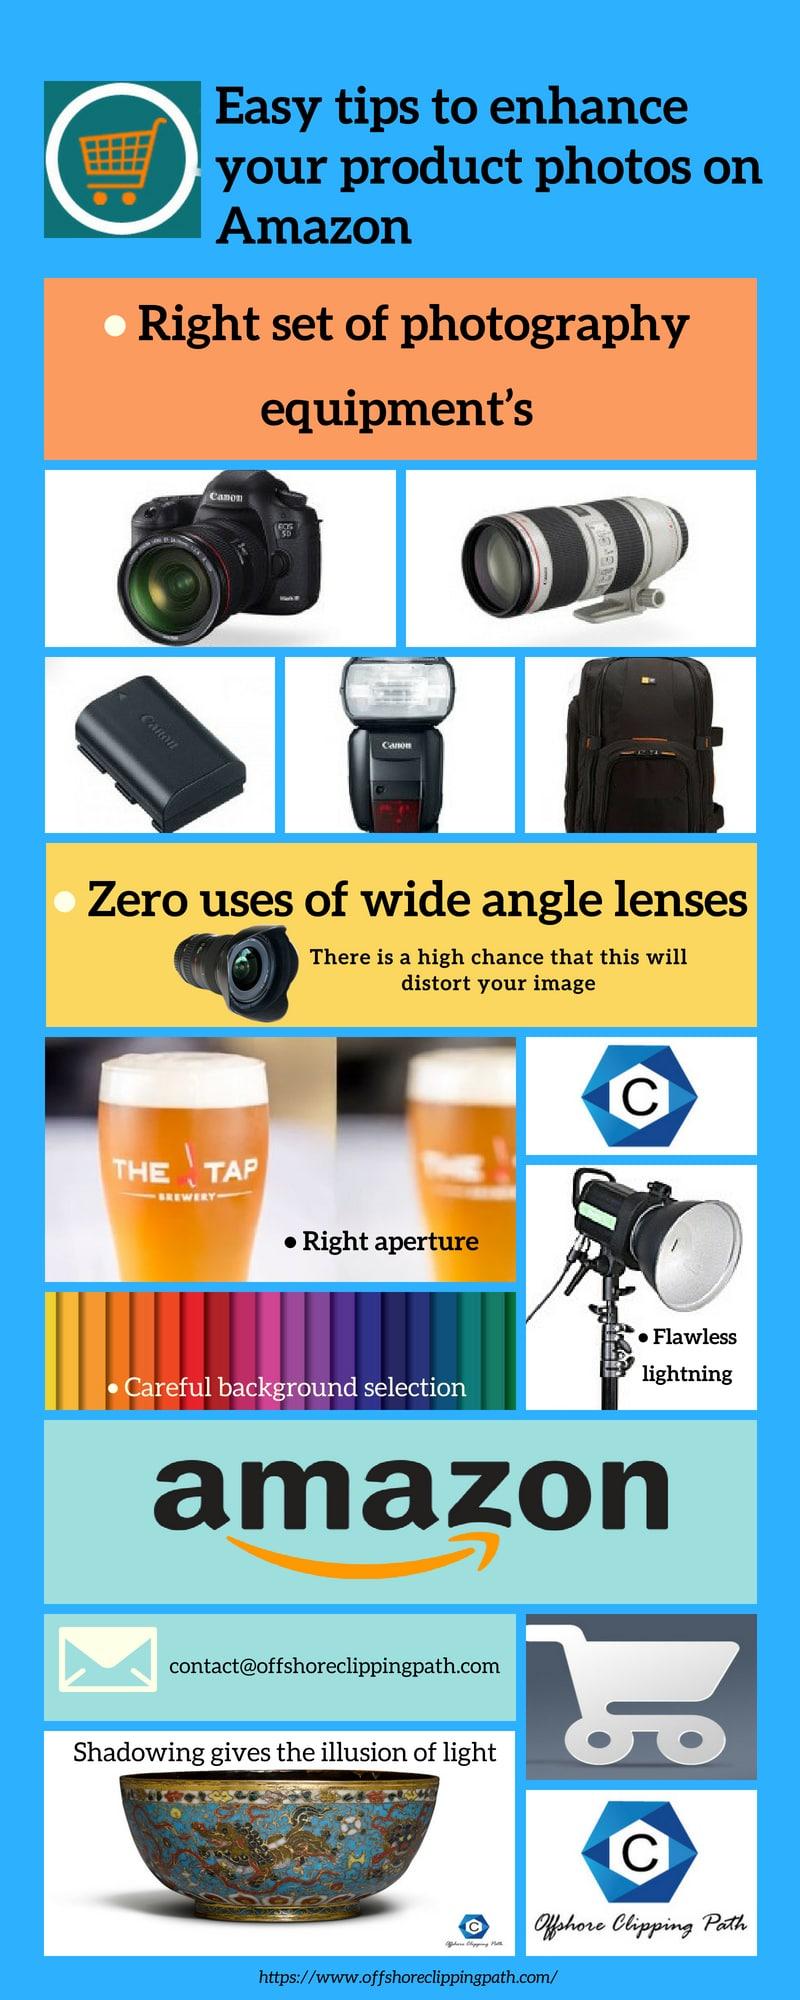 Amazon Product image Infographic